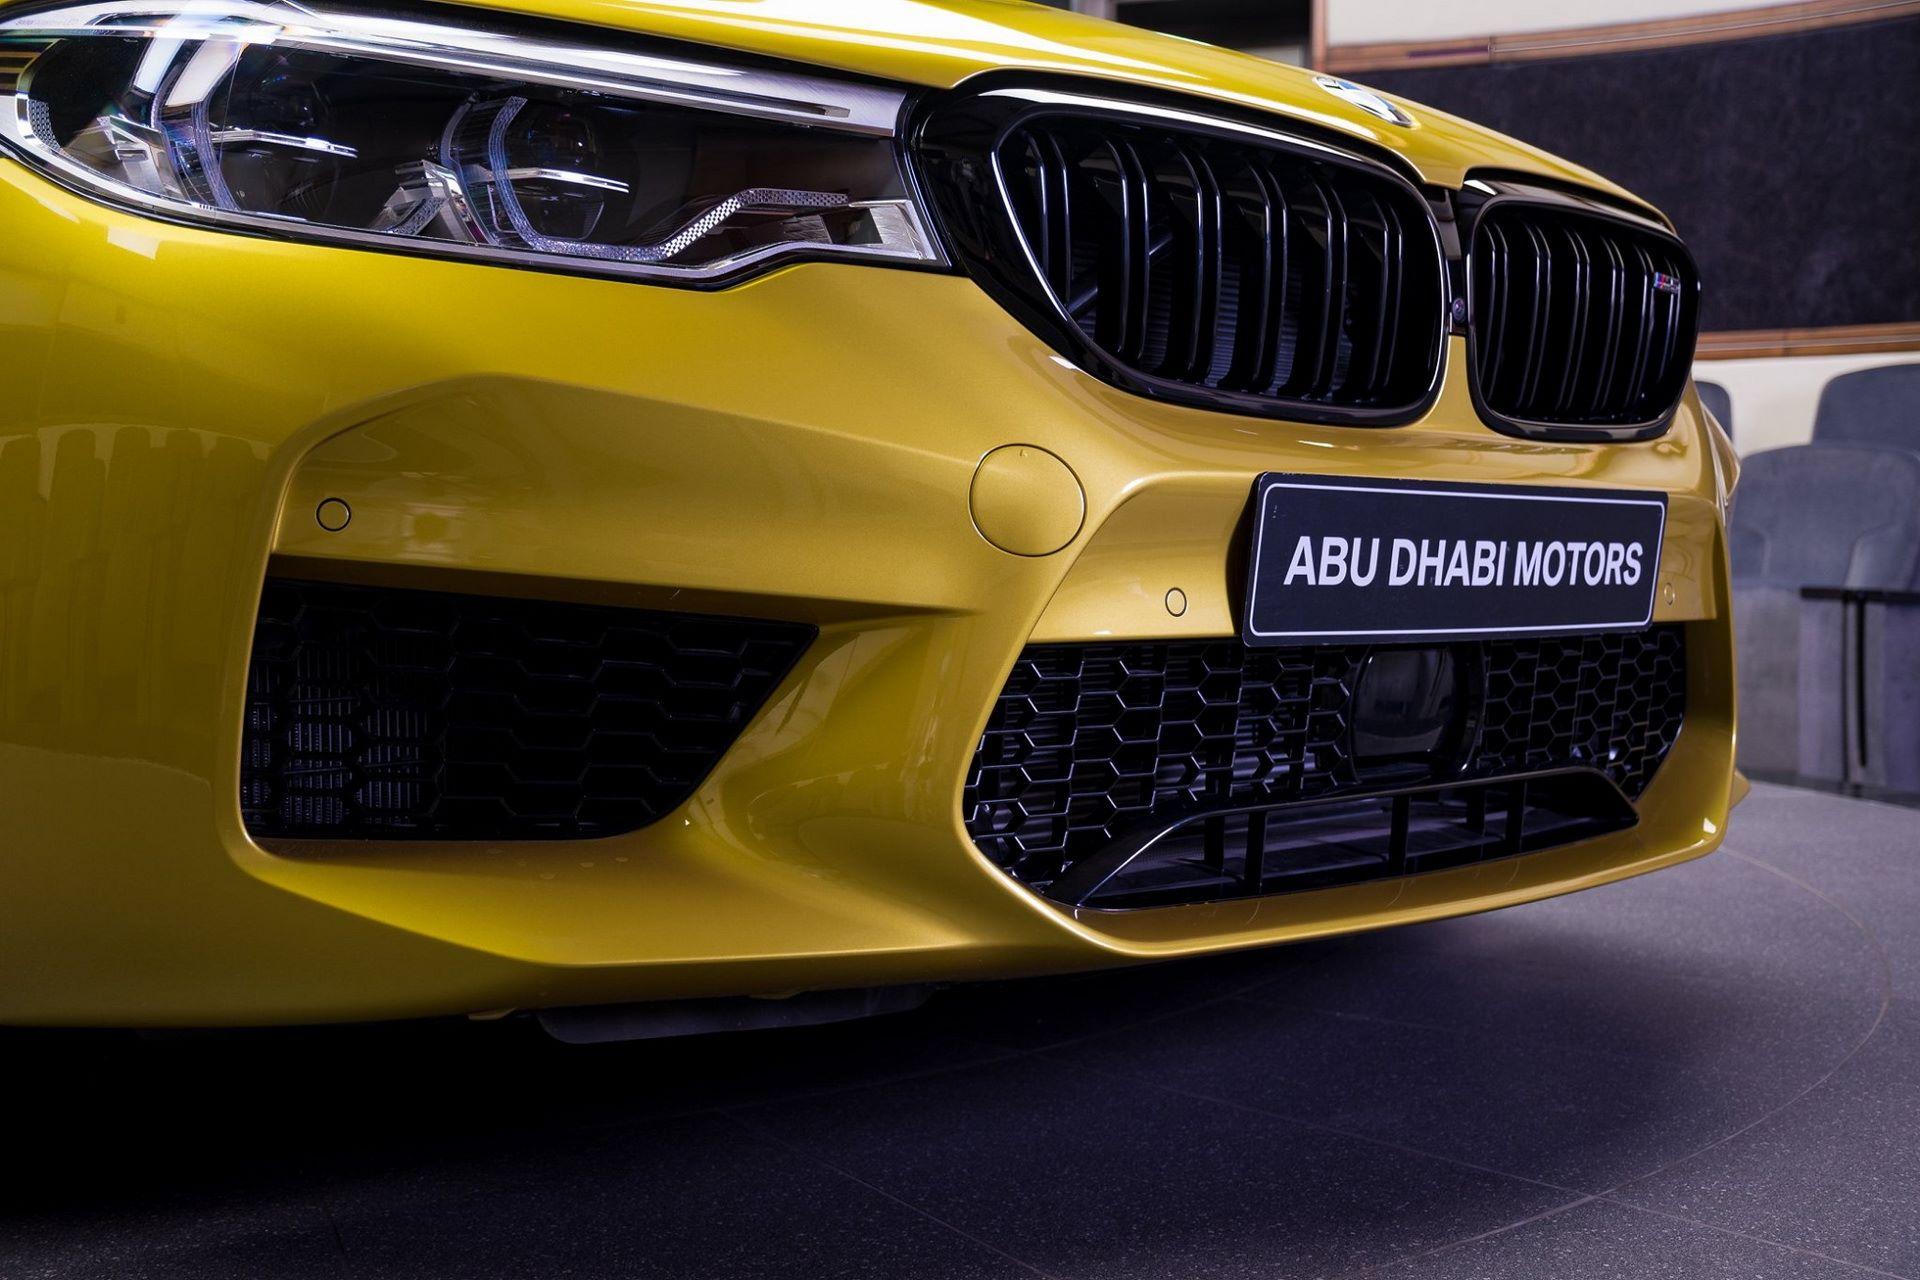 BMW-M5-Competition-Austin-Yellow-Abu-Dhabi-Motors-12